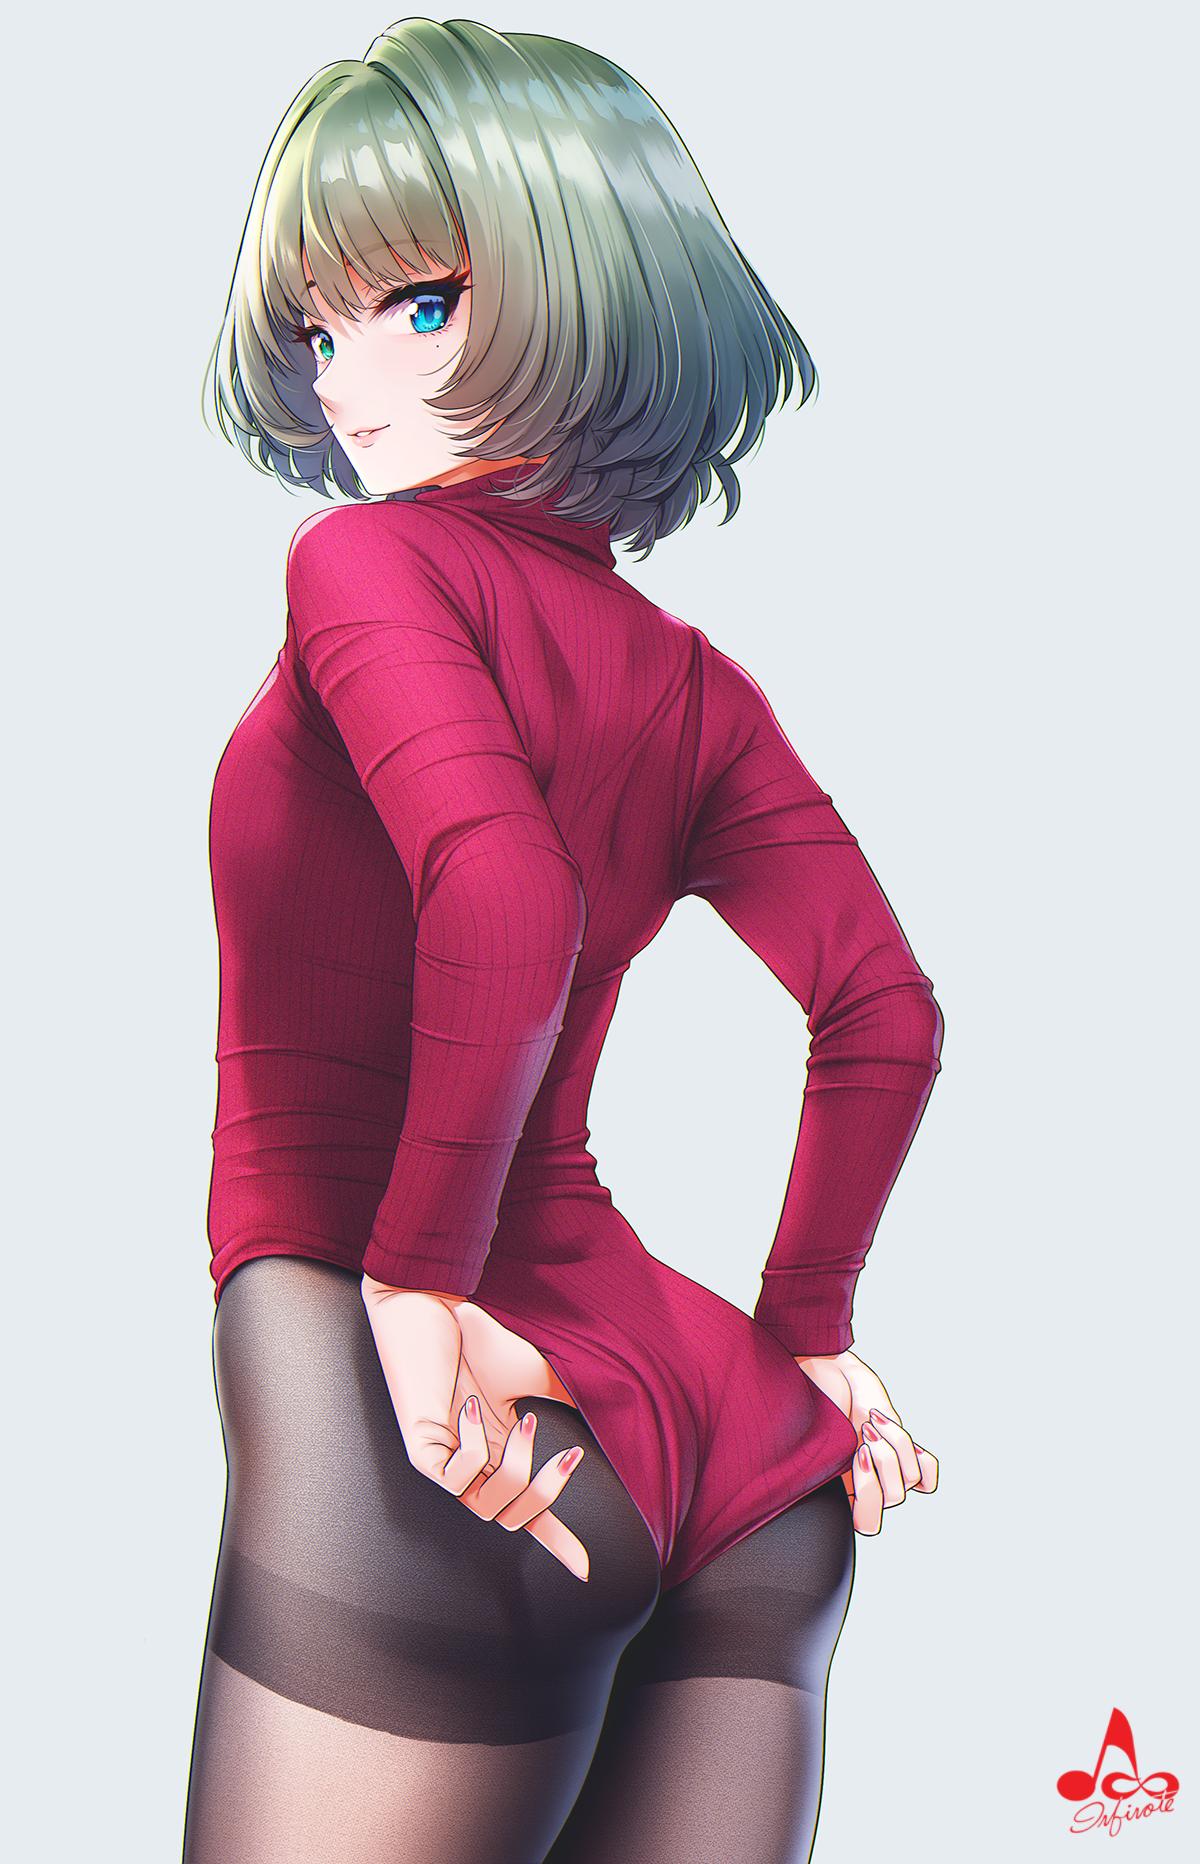 Anime 1200x1864 anime anime girls digital art artwork 2D portrait display vertical THE iDOLM@STER infinote